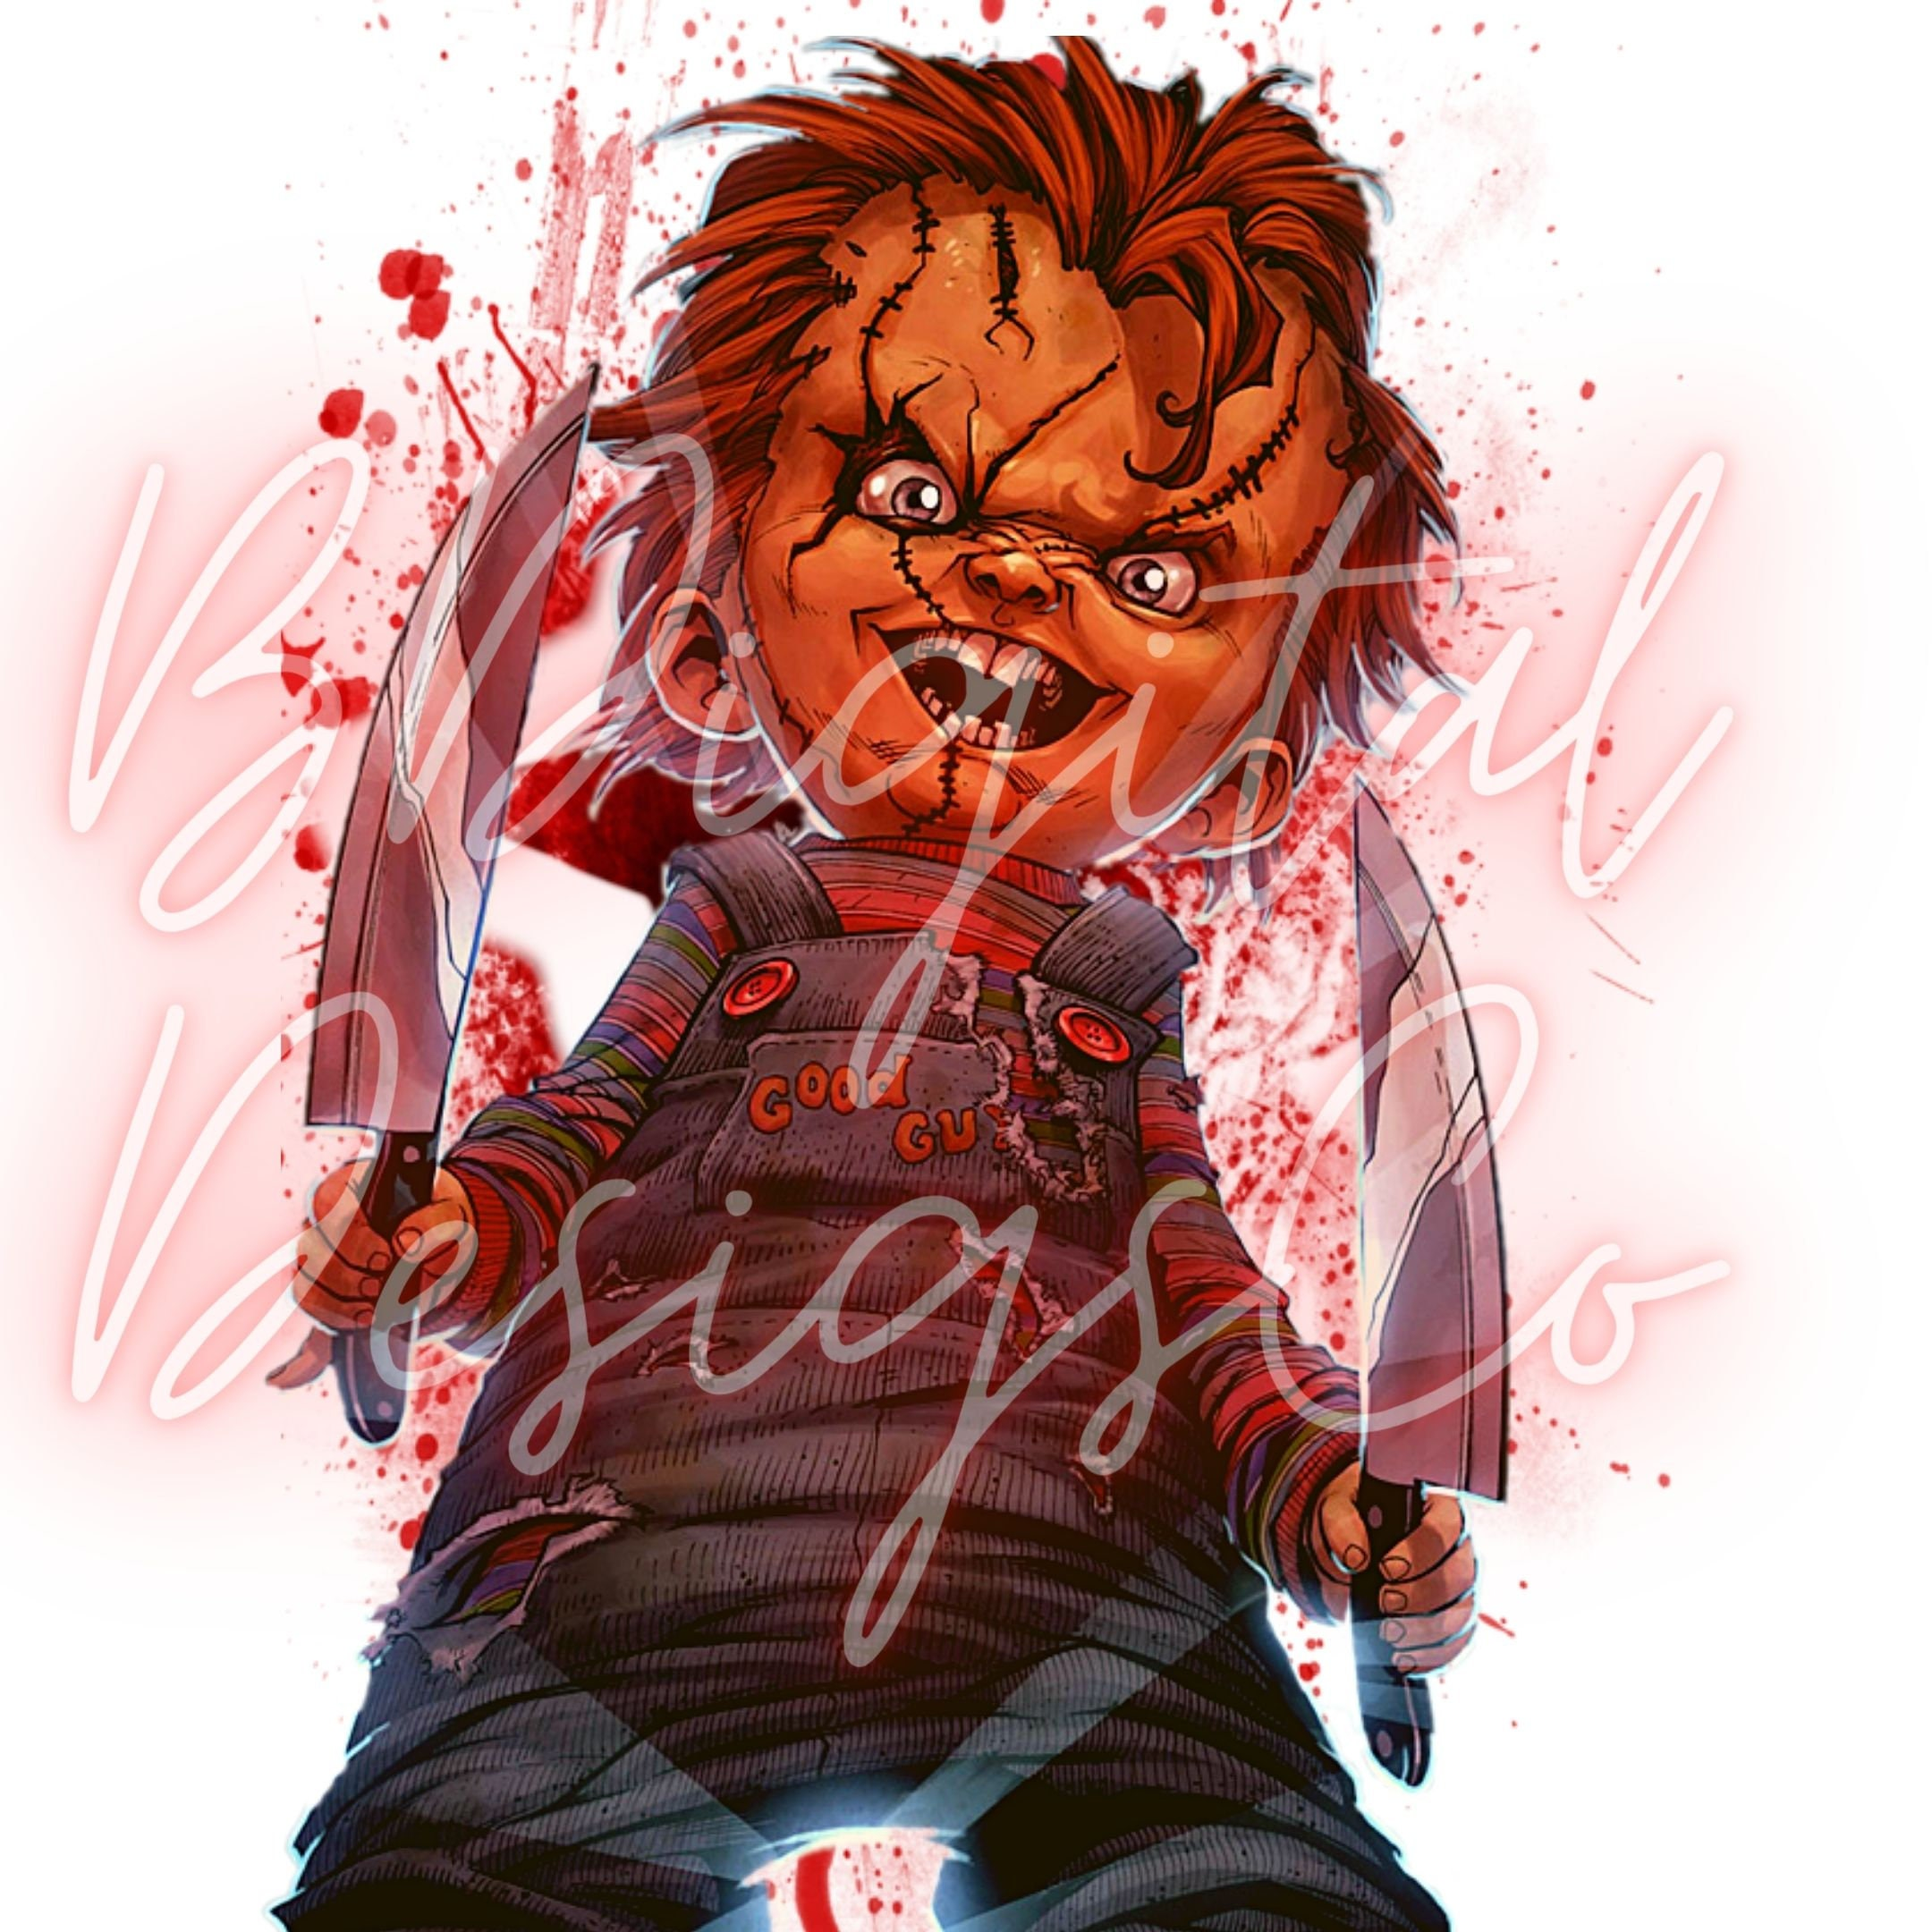 Chucky Svg , Chucky Horror movie SVG, Halloween Svg, Movie Character Killer Svg , Cricut SVG Files , Childs play design, Digital File